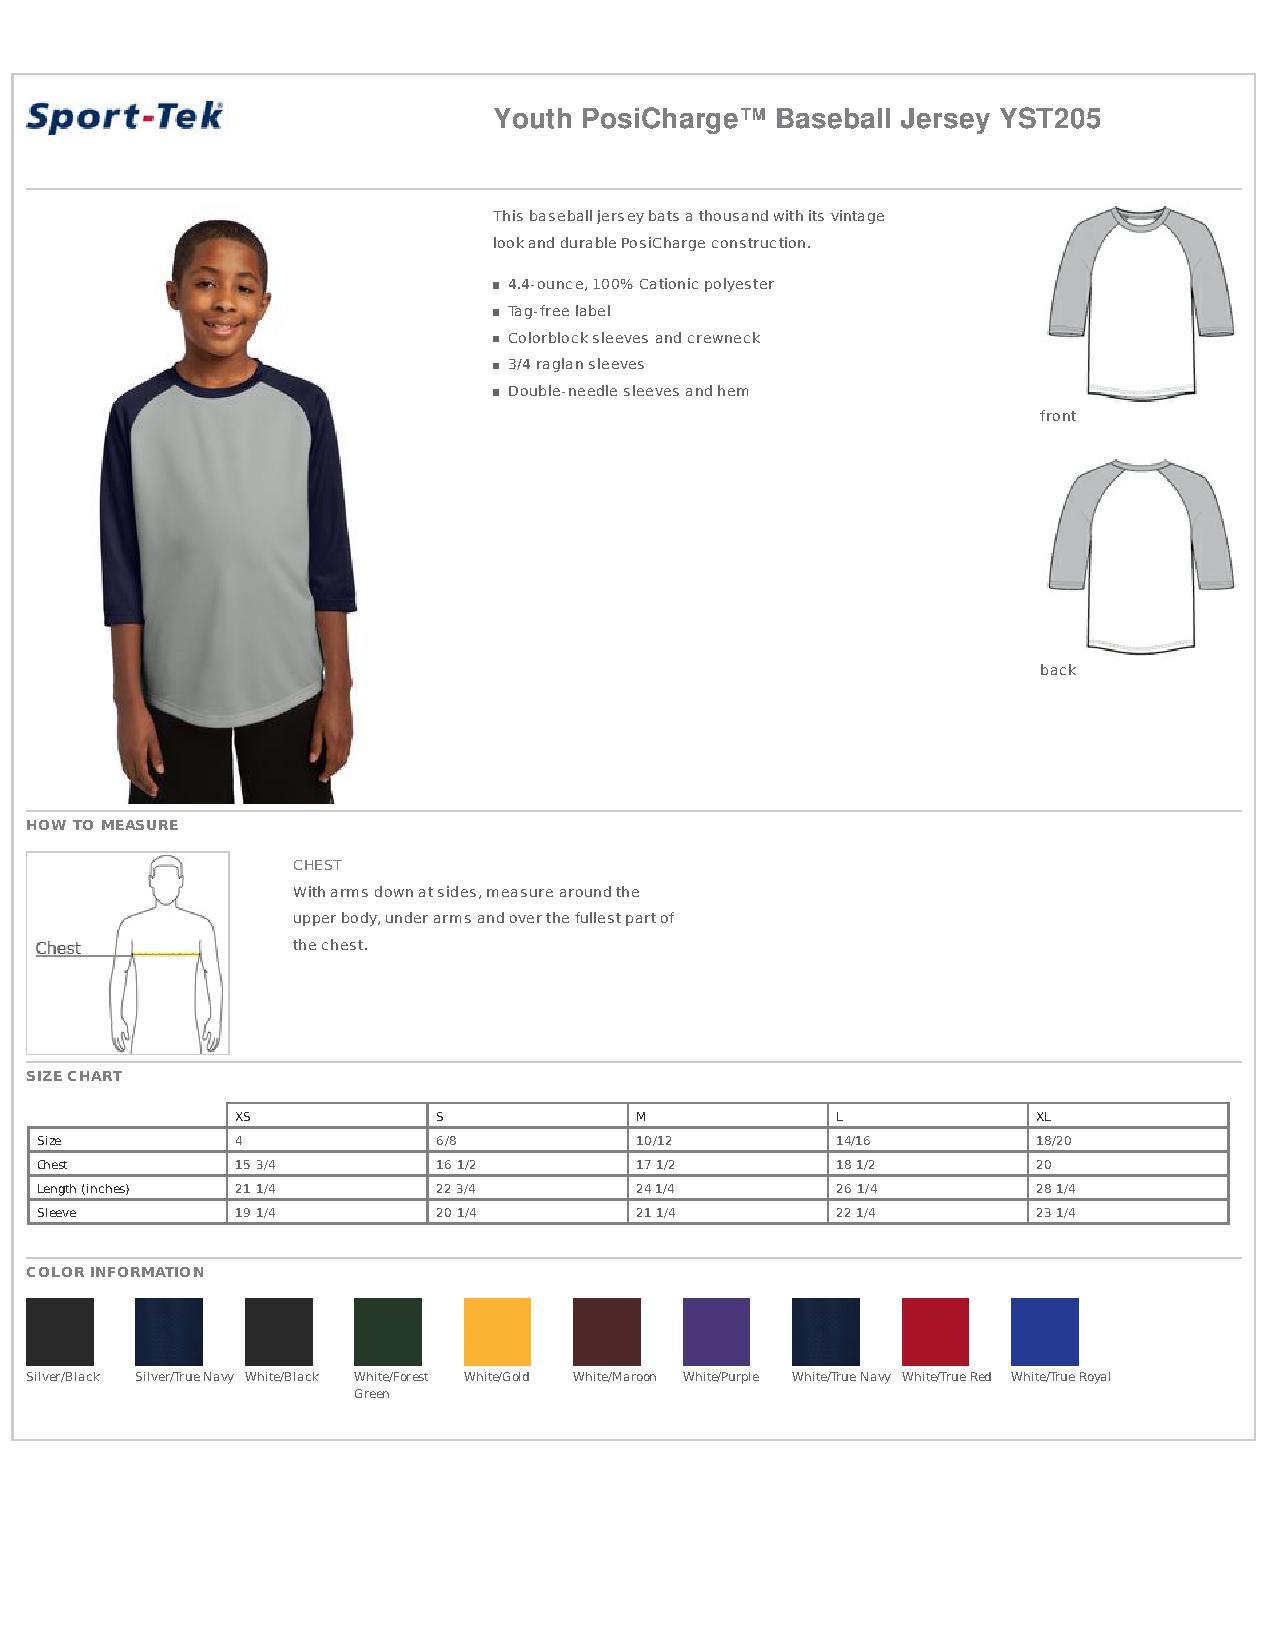 7aad4a898 Sport-Tek® YST205 Youth PosiCharge™ Baseball Jersey - T Shirts